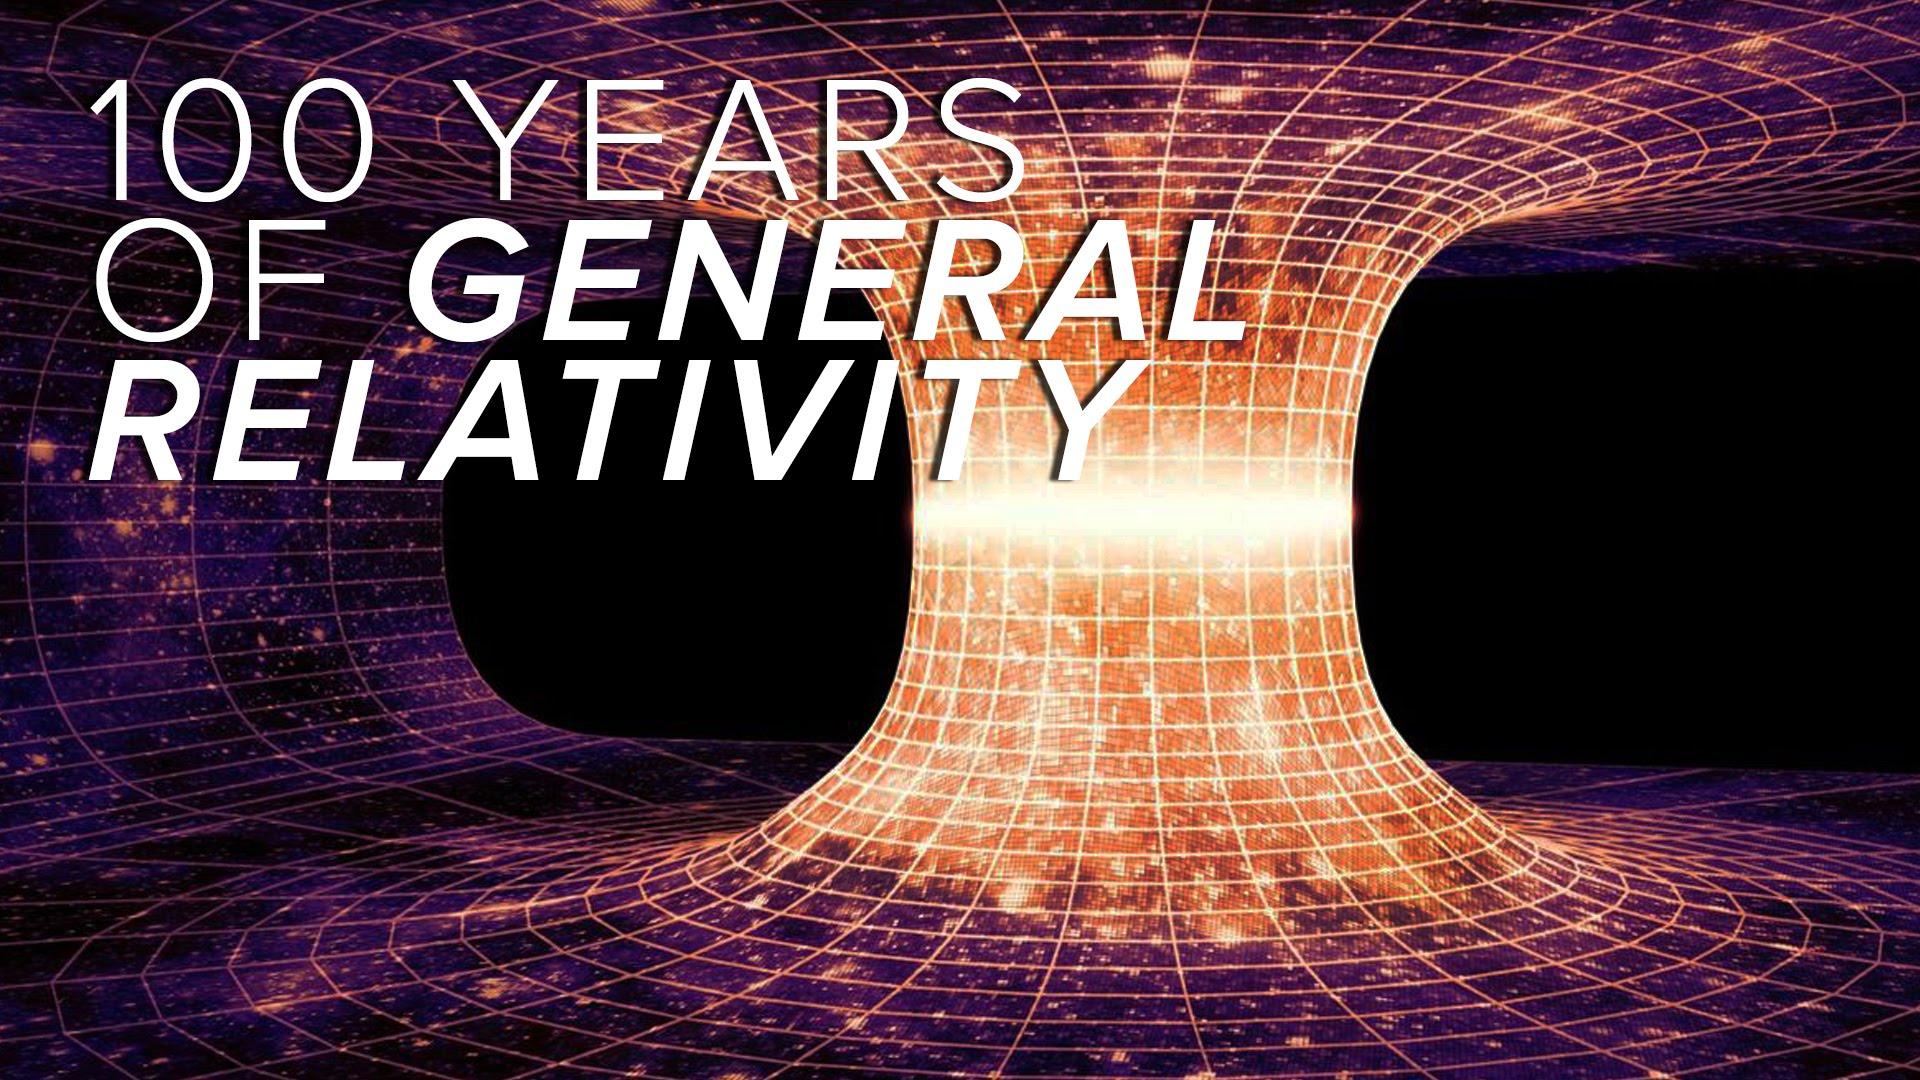 Albert Einstein's Theory of General Relativity at its 100th anniversary!